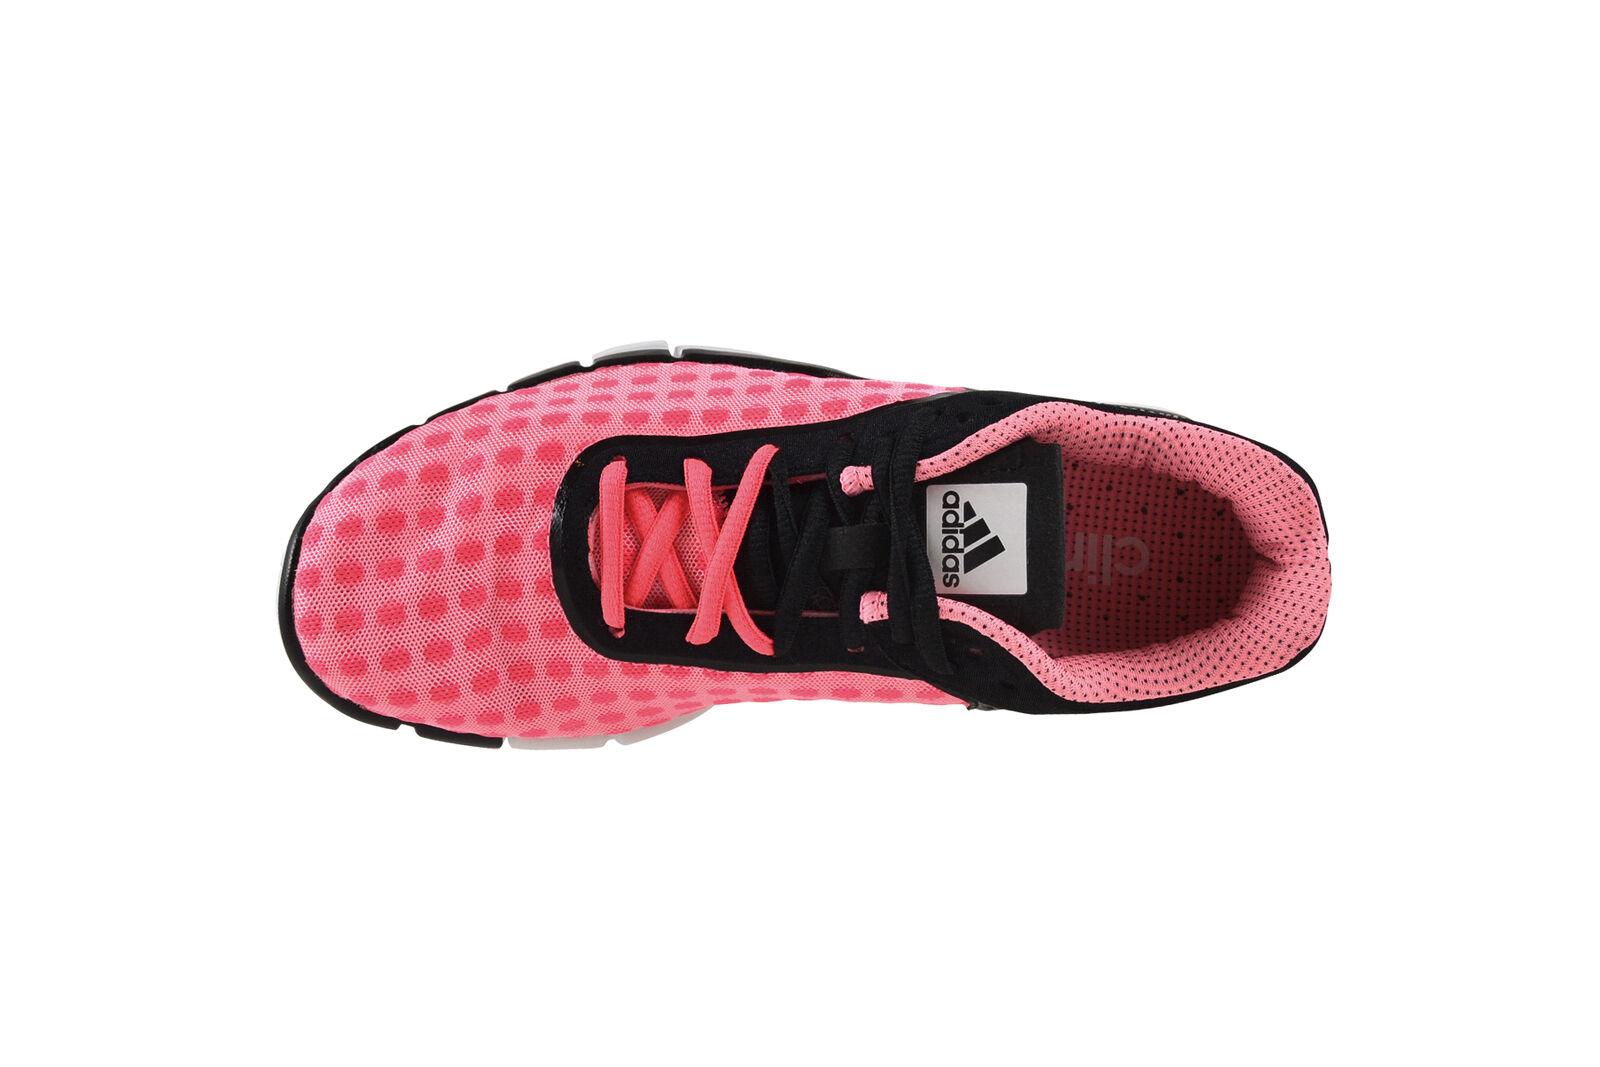 a031cea4 Adidas Adipure 360.2 Chill Women flared/cblack/ltflre Sneaker/zapatos Pink  b35922 fb5236 - alumnisef.es